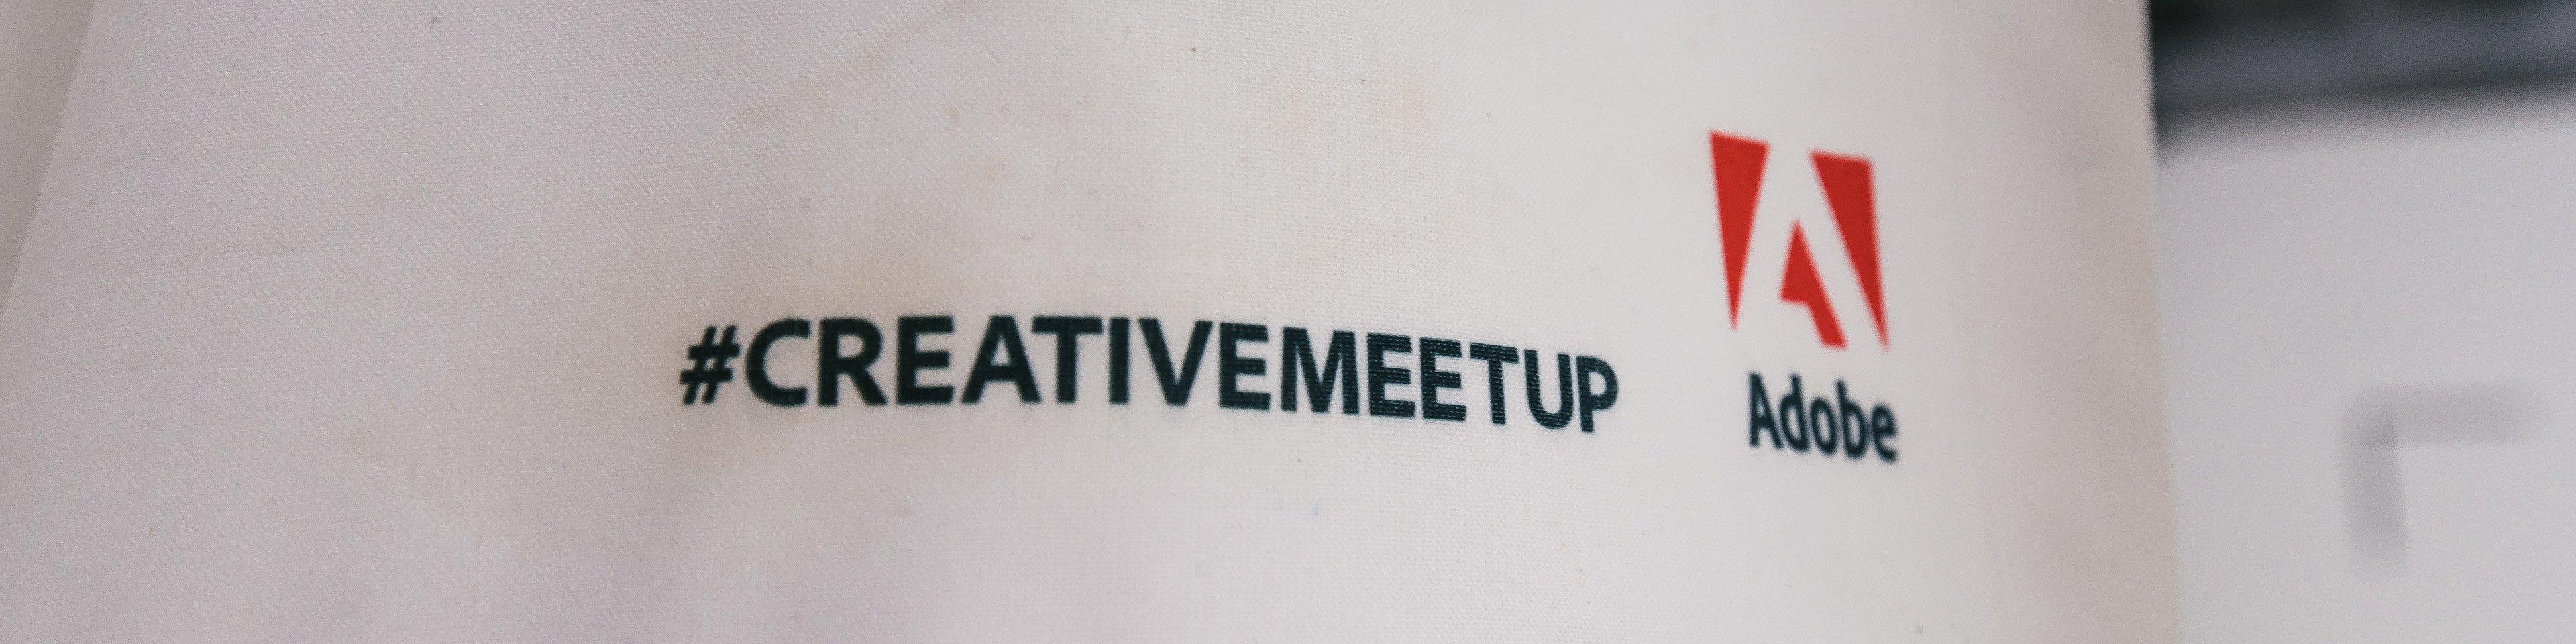 Adobe #CreativeMeetup